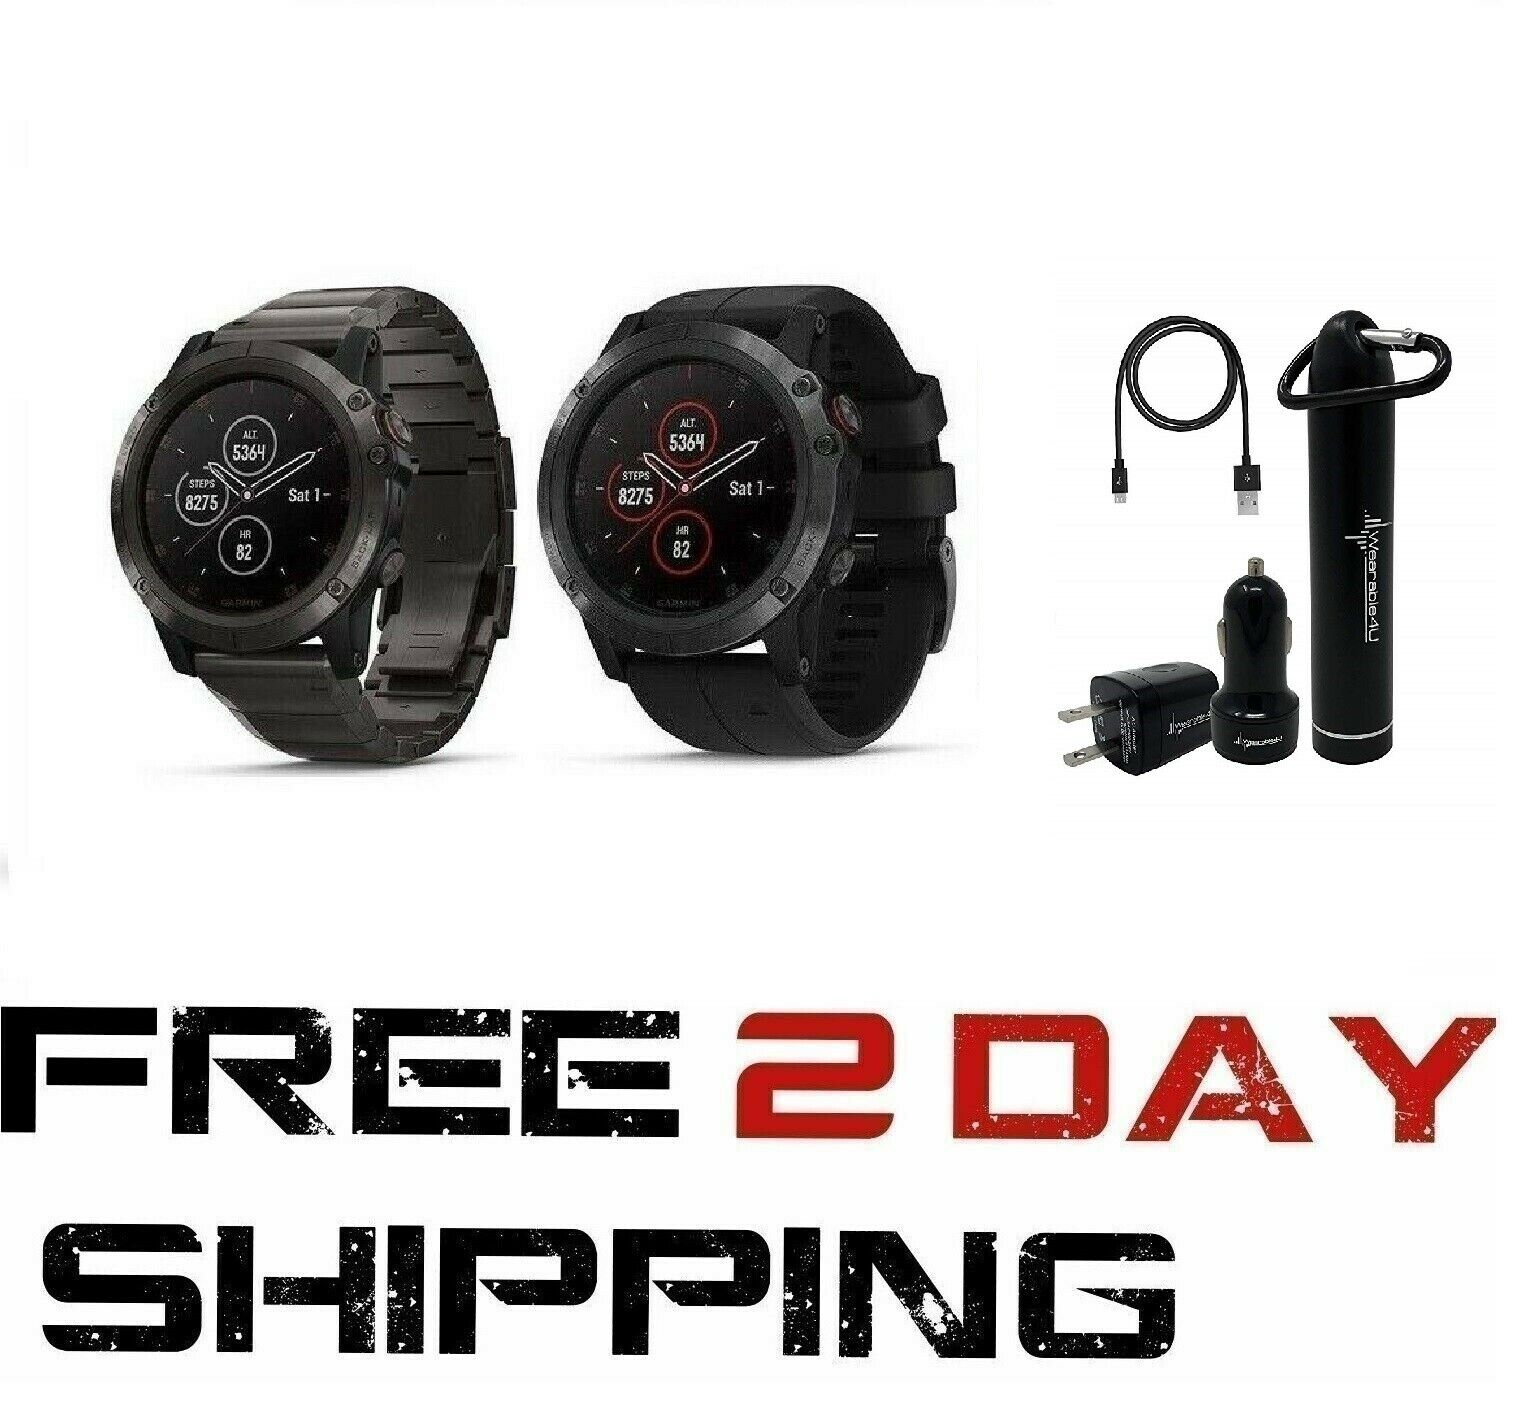 Garmin Fenix 5X Plus Zafiro EcoTread GPS reloj con alimentación 4U usable